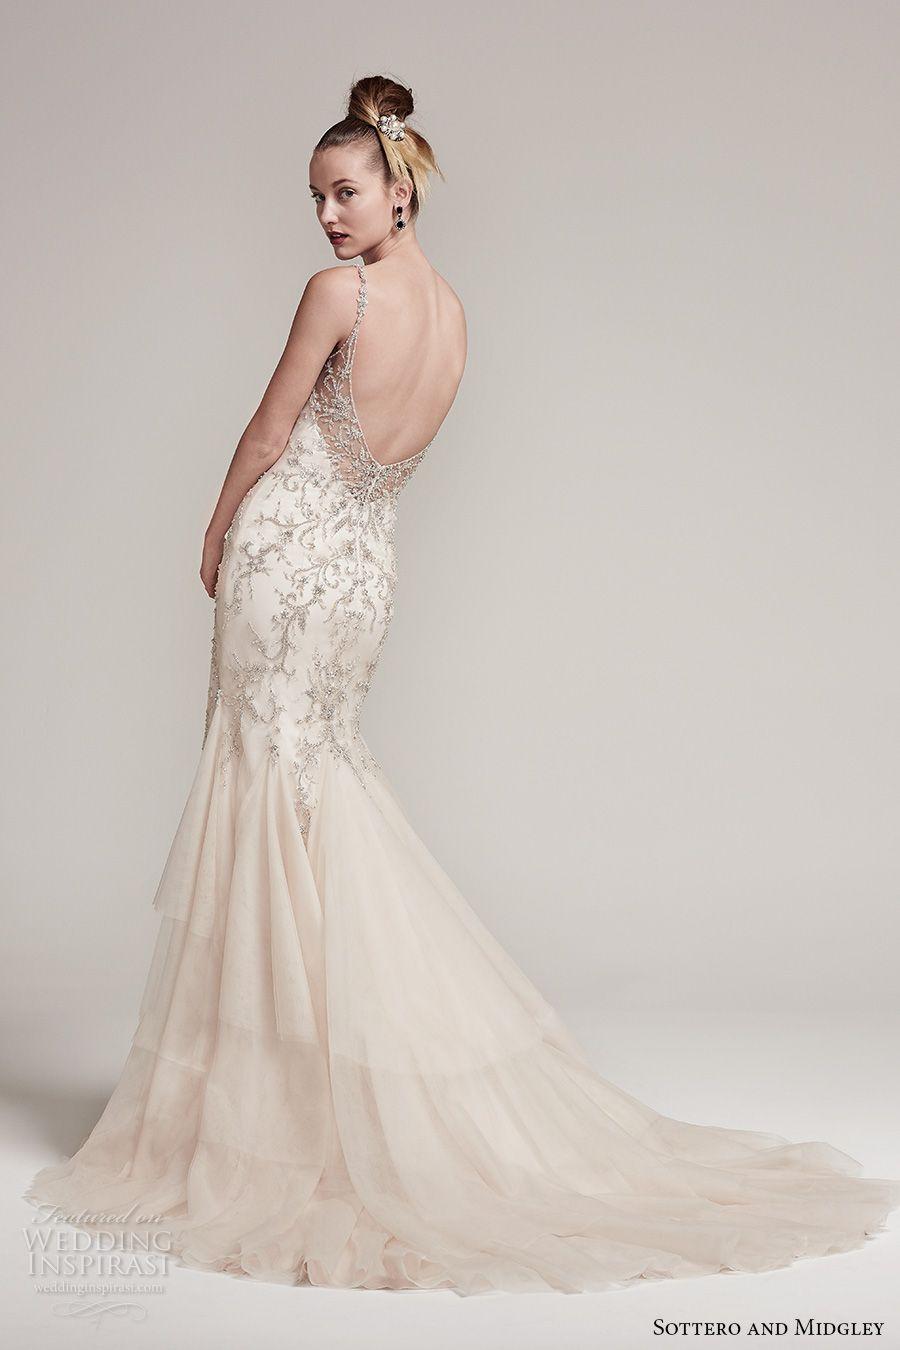 sottero midgley fall 2016 bridal sleeveless spagetti strap v neck heavily  embellished bodice elegant glamorous fit and flare wedding dress open back  chapel ... 2b6a7a069